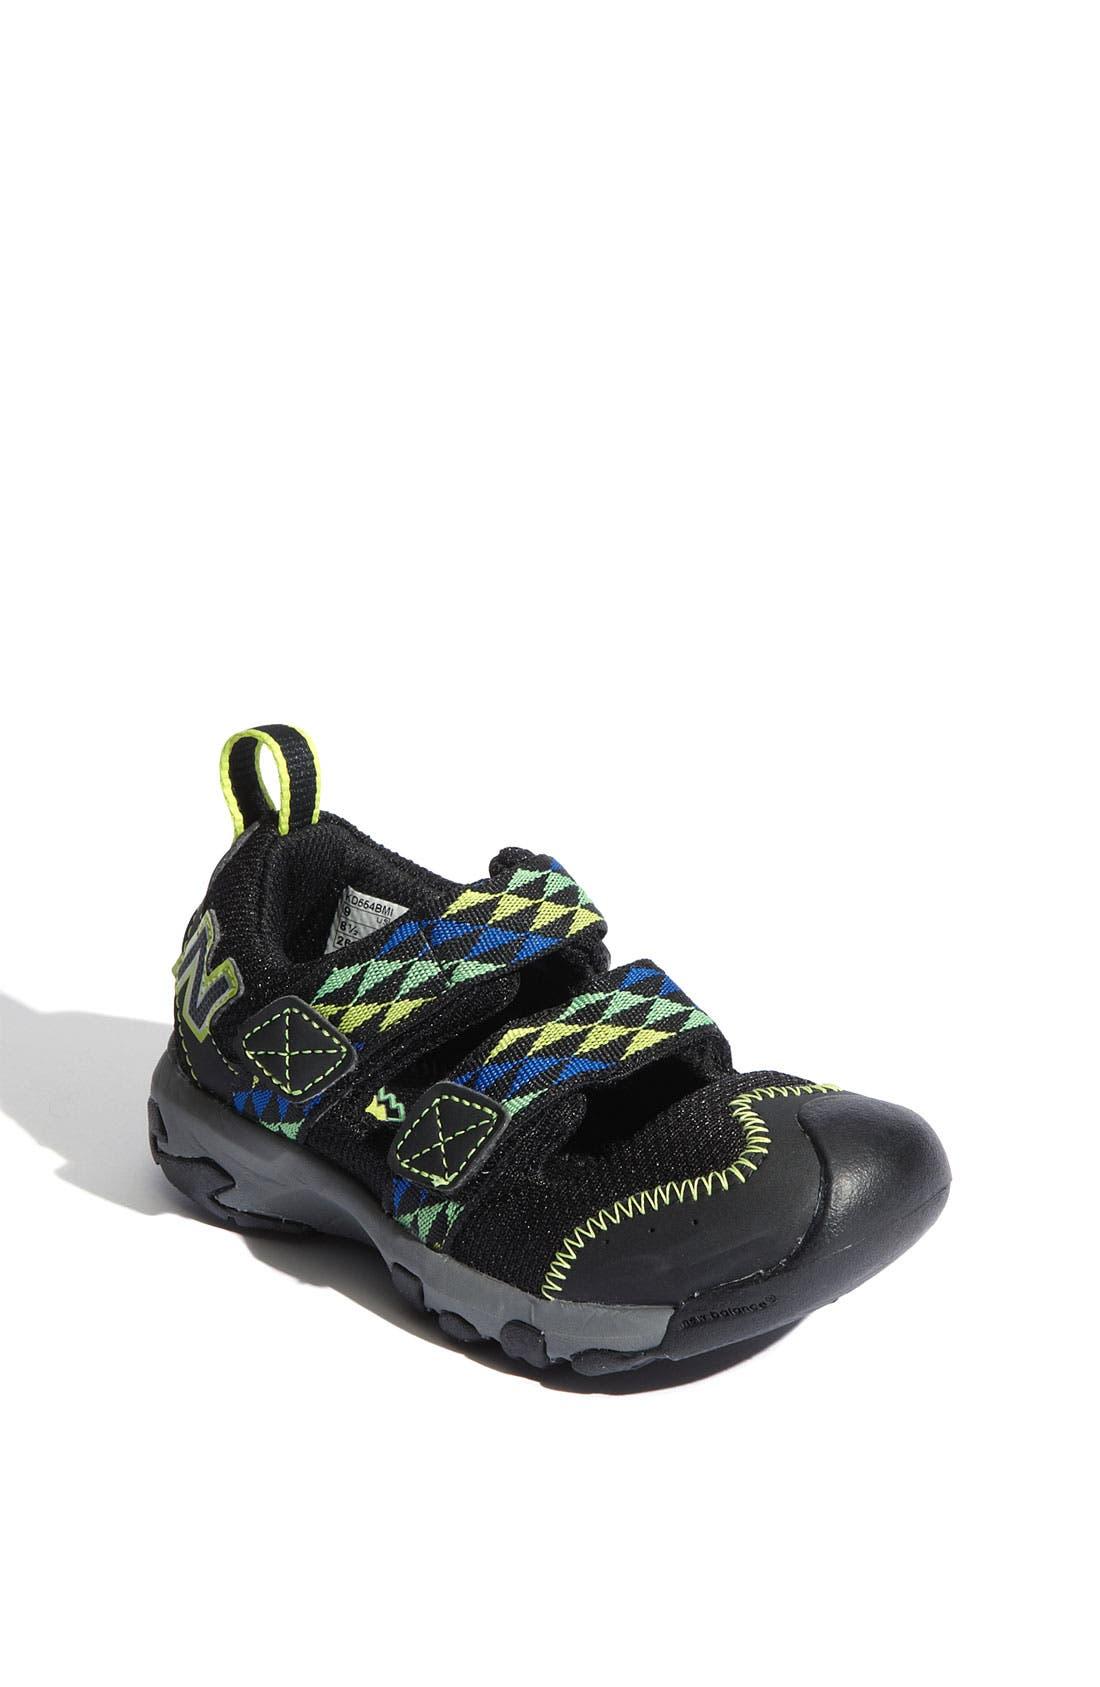 '554' Water Shoe,                             Main thumbnail 1, color,                             001